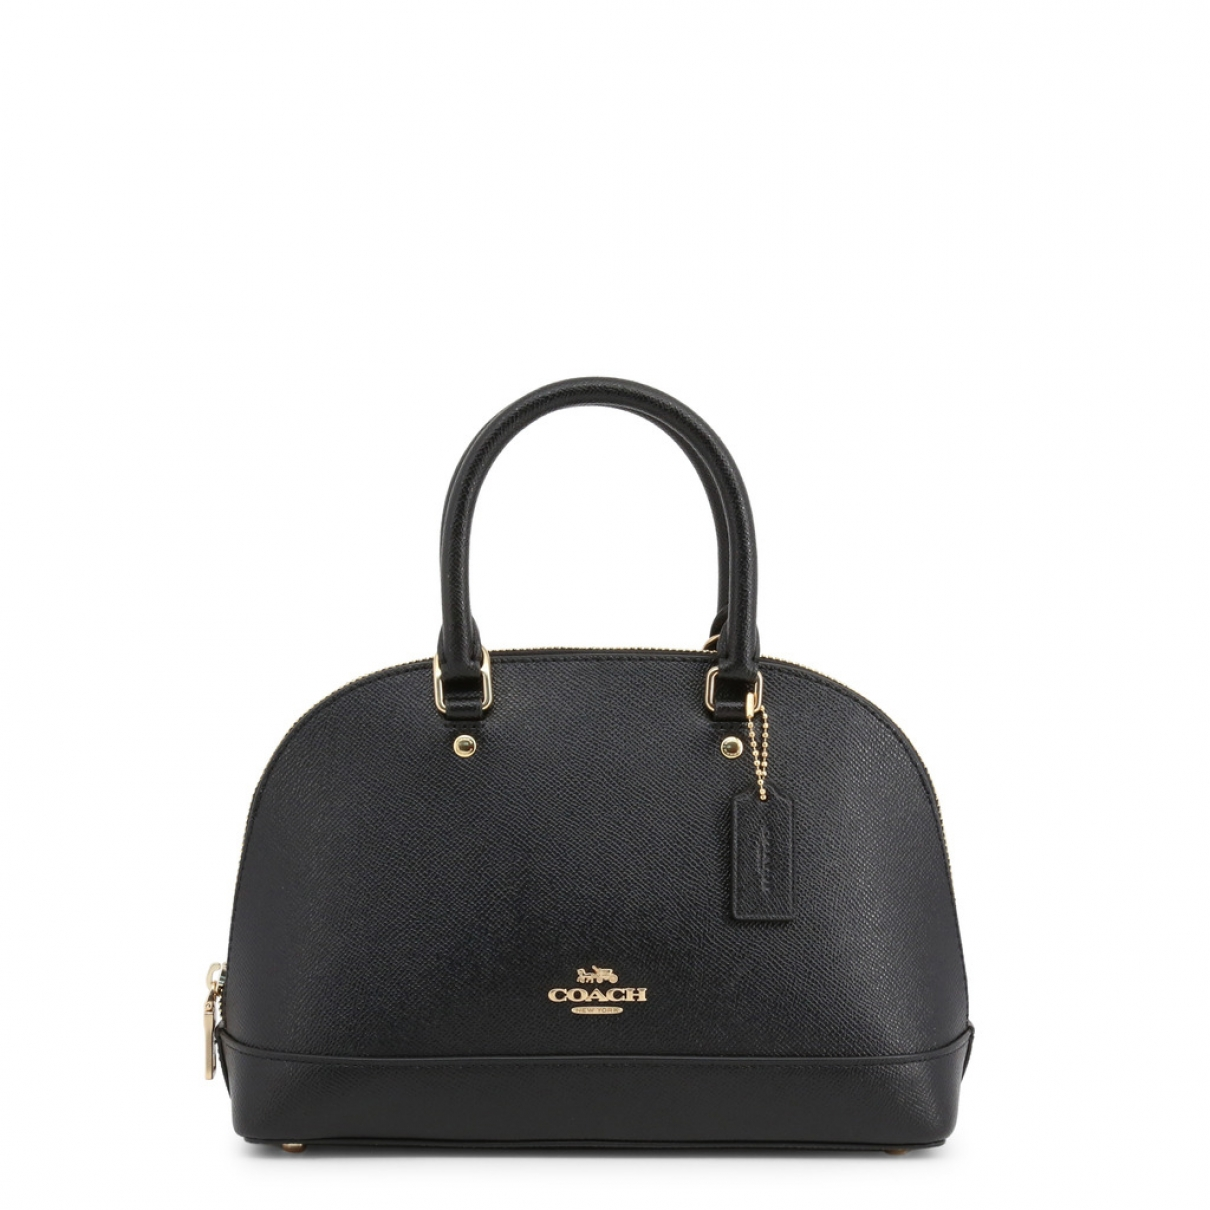 Coach Cartable mini sierra Black Leather handbag for Women \N